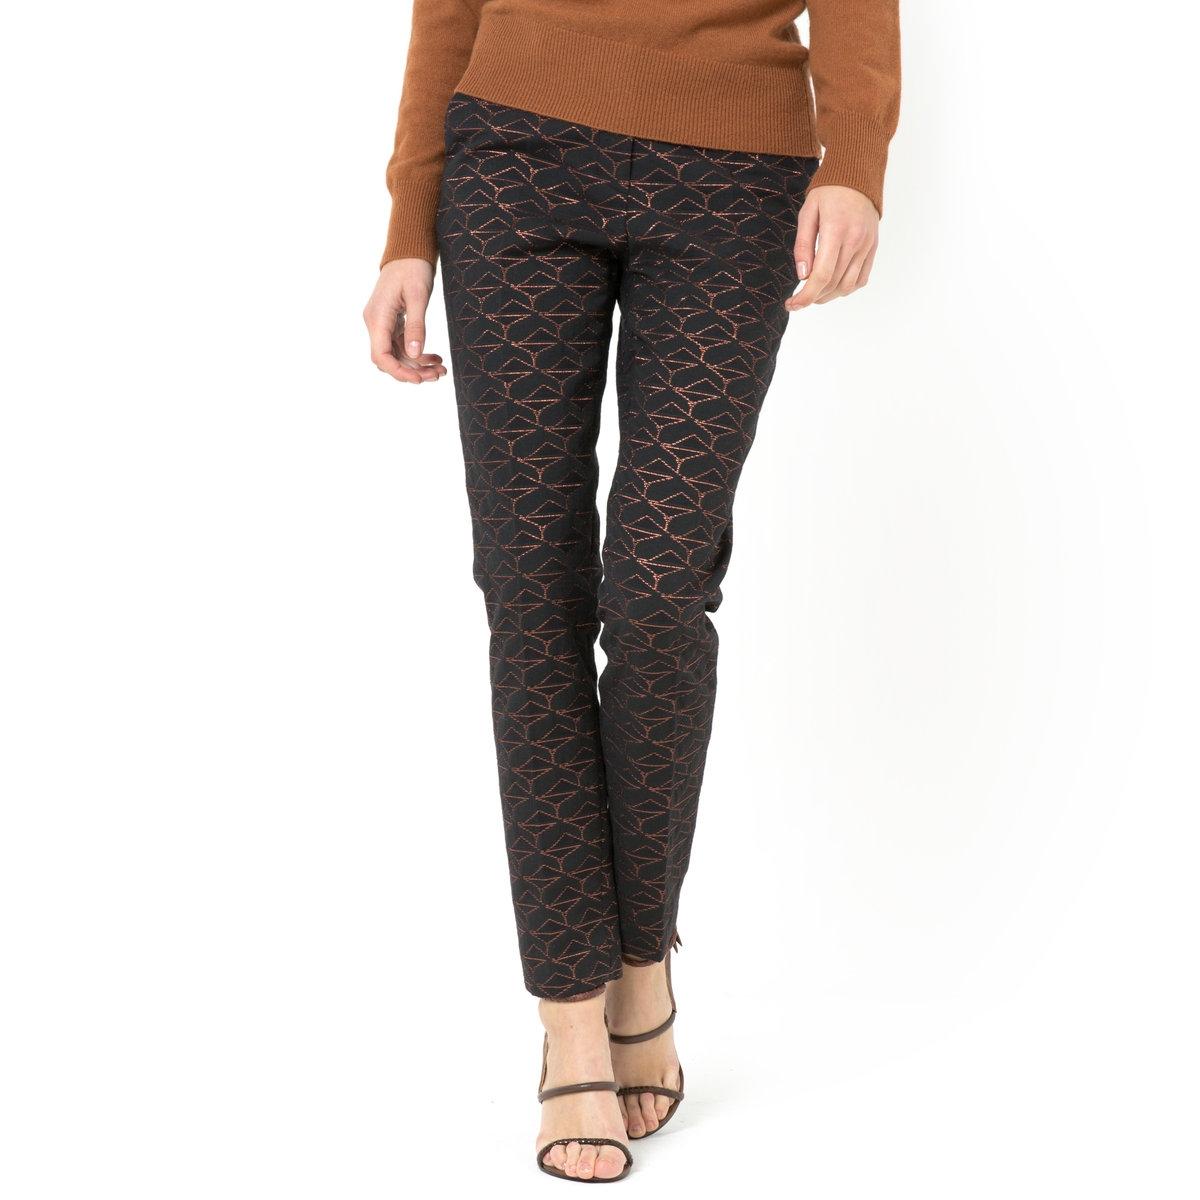 Брюки-дудочки Soft Grey брюки дудочки 7 8 фланелевые